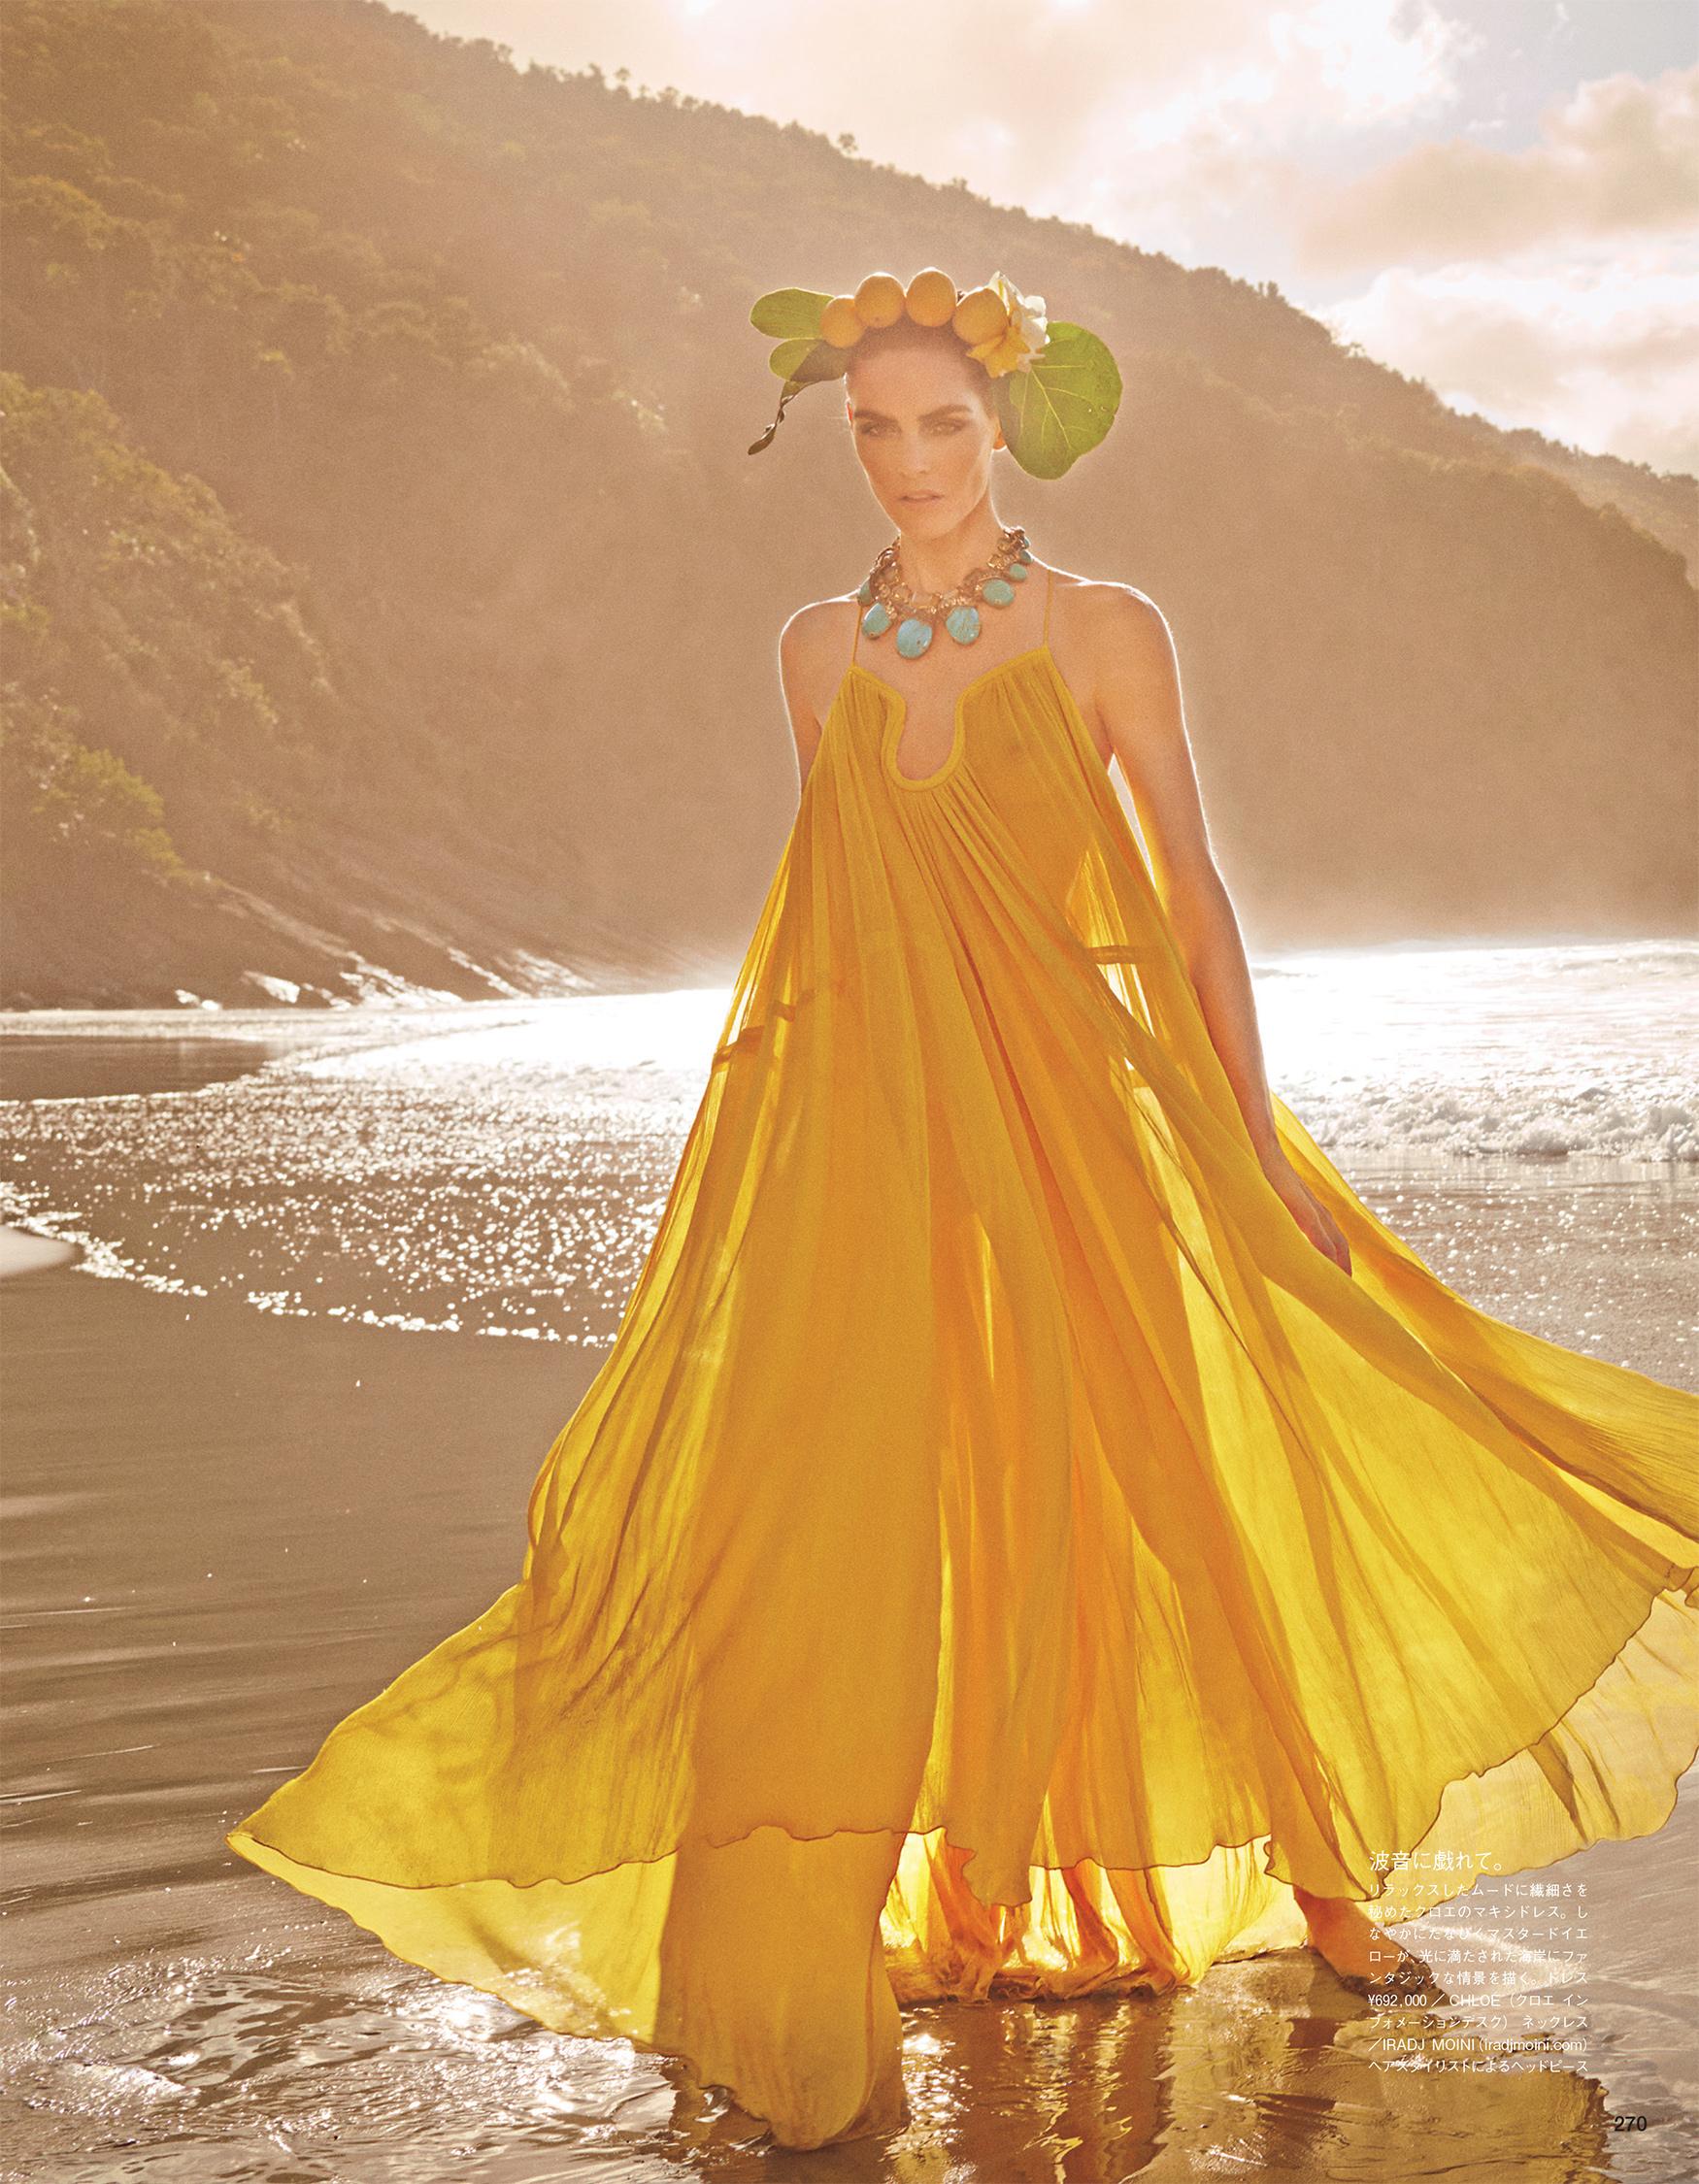 Giovanna-Battaglia-Vogue-Japan-Mariano-Vivanco-Forbidden-Paradise-12.jpg